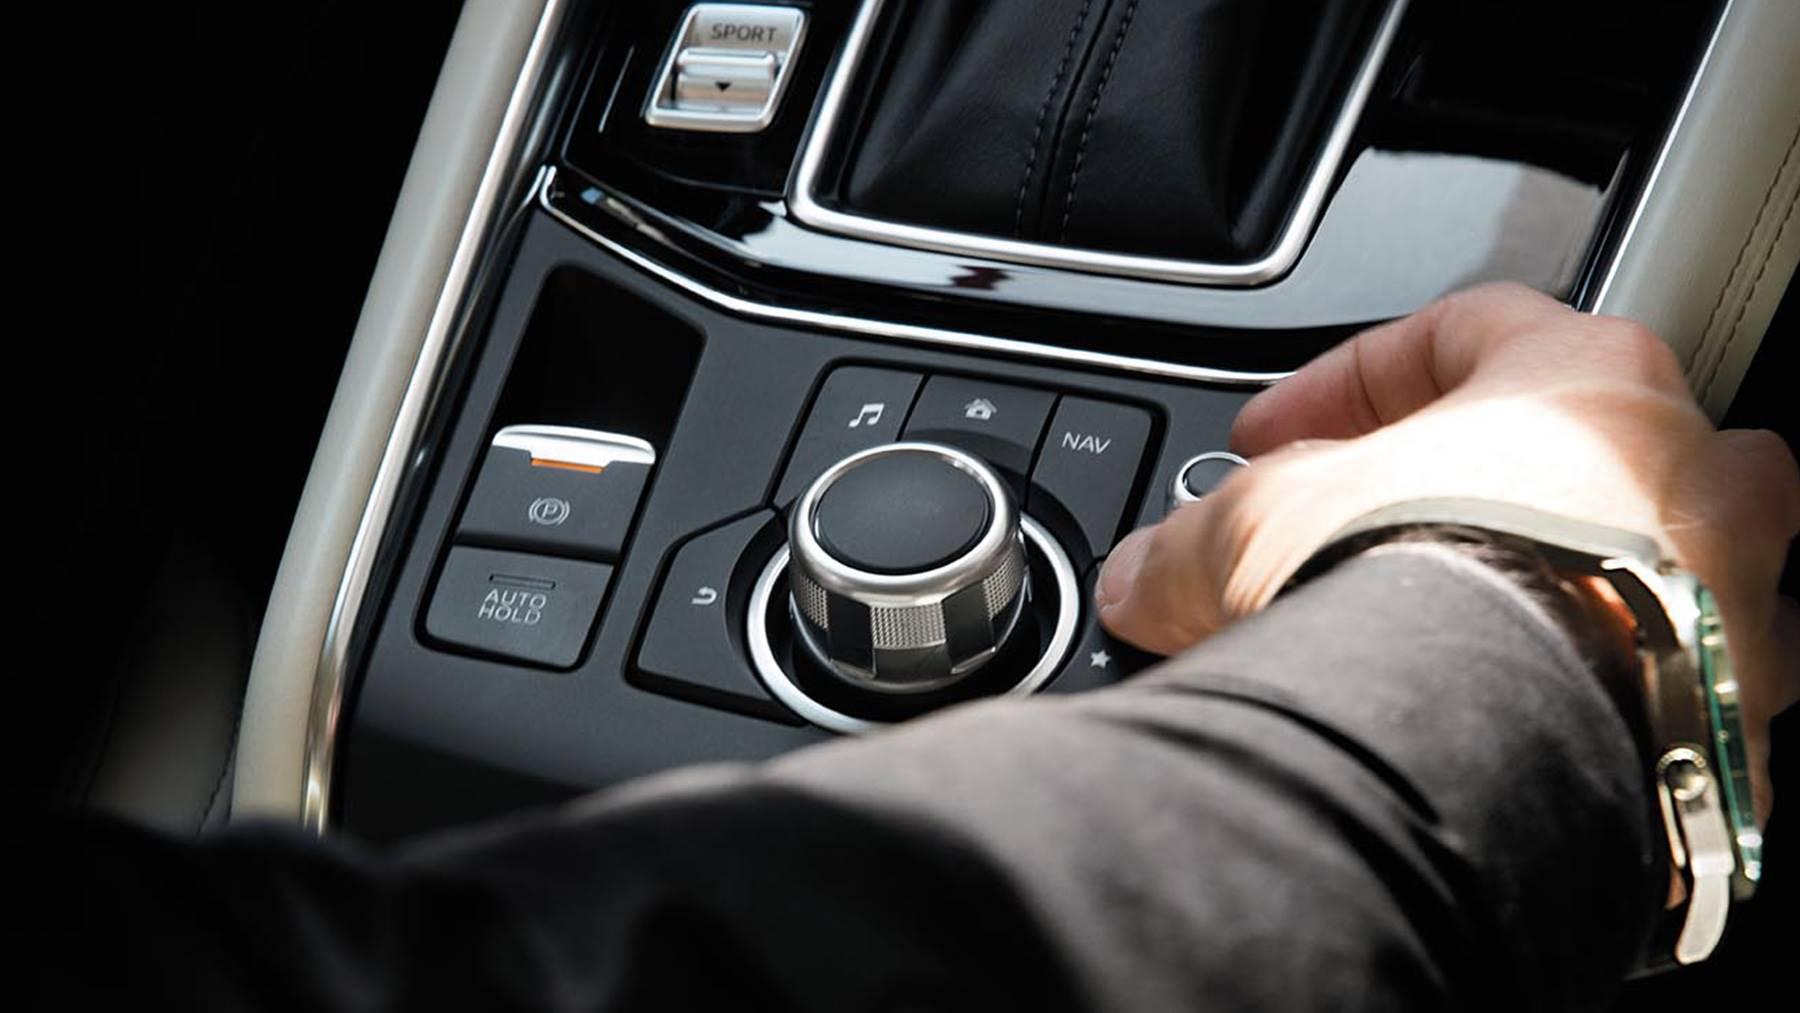 Plentiful Features in the Mazda CX-5